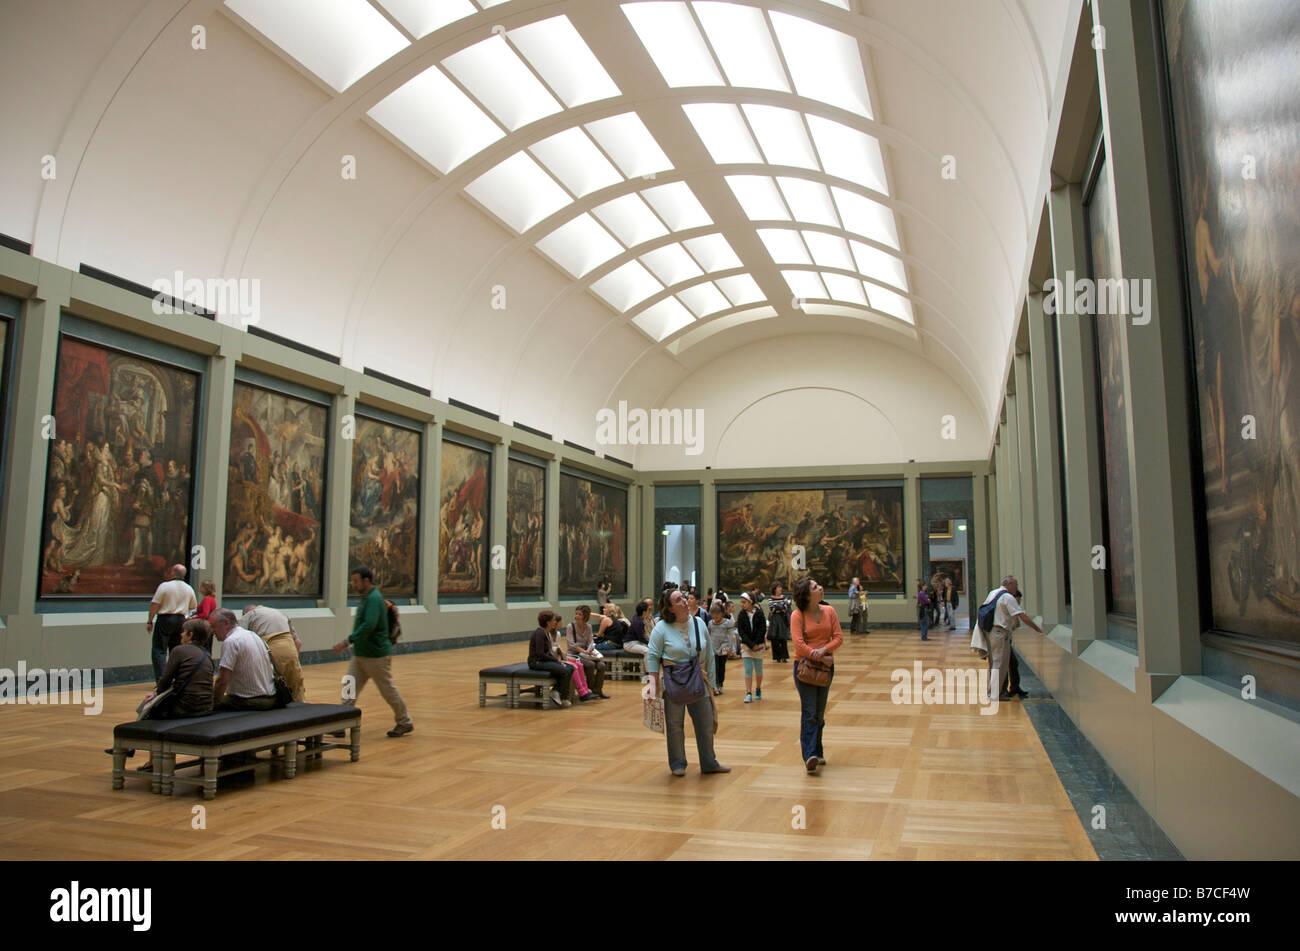 Louvre art gallery, interior, Paris, France - Stock Image